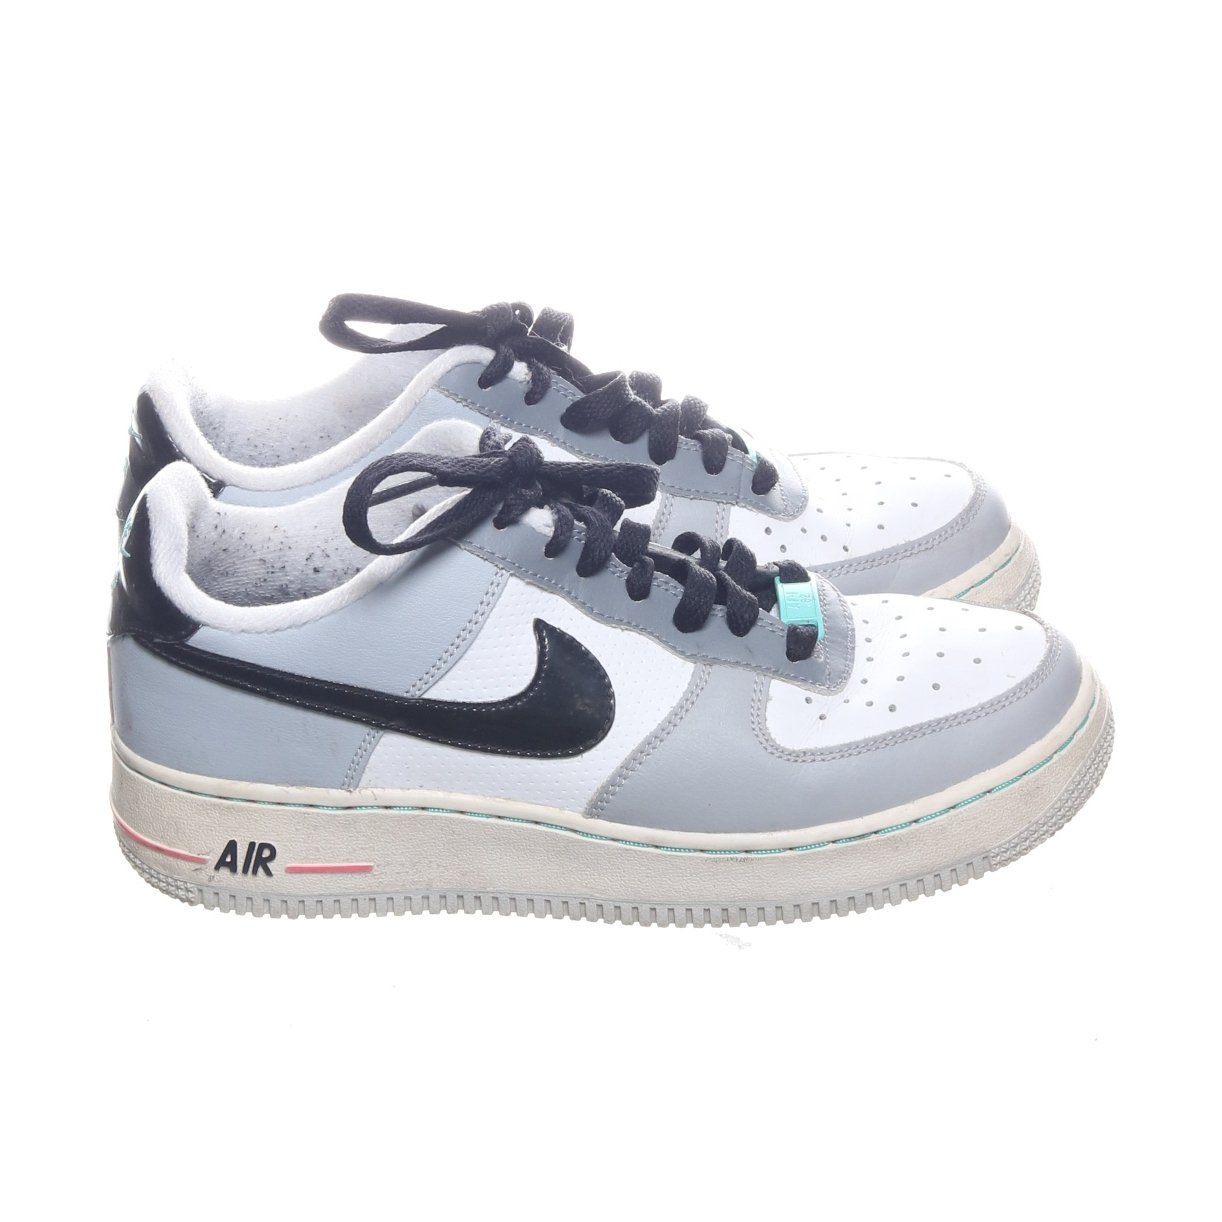 Nike, Sneakers, Strl: 38, Air Force 1, VitGråSvart